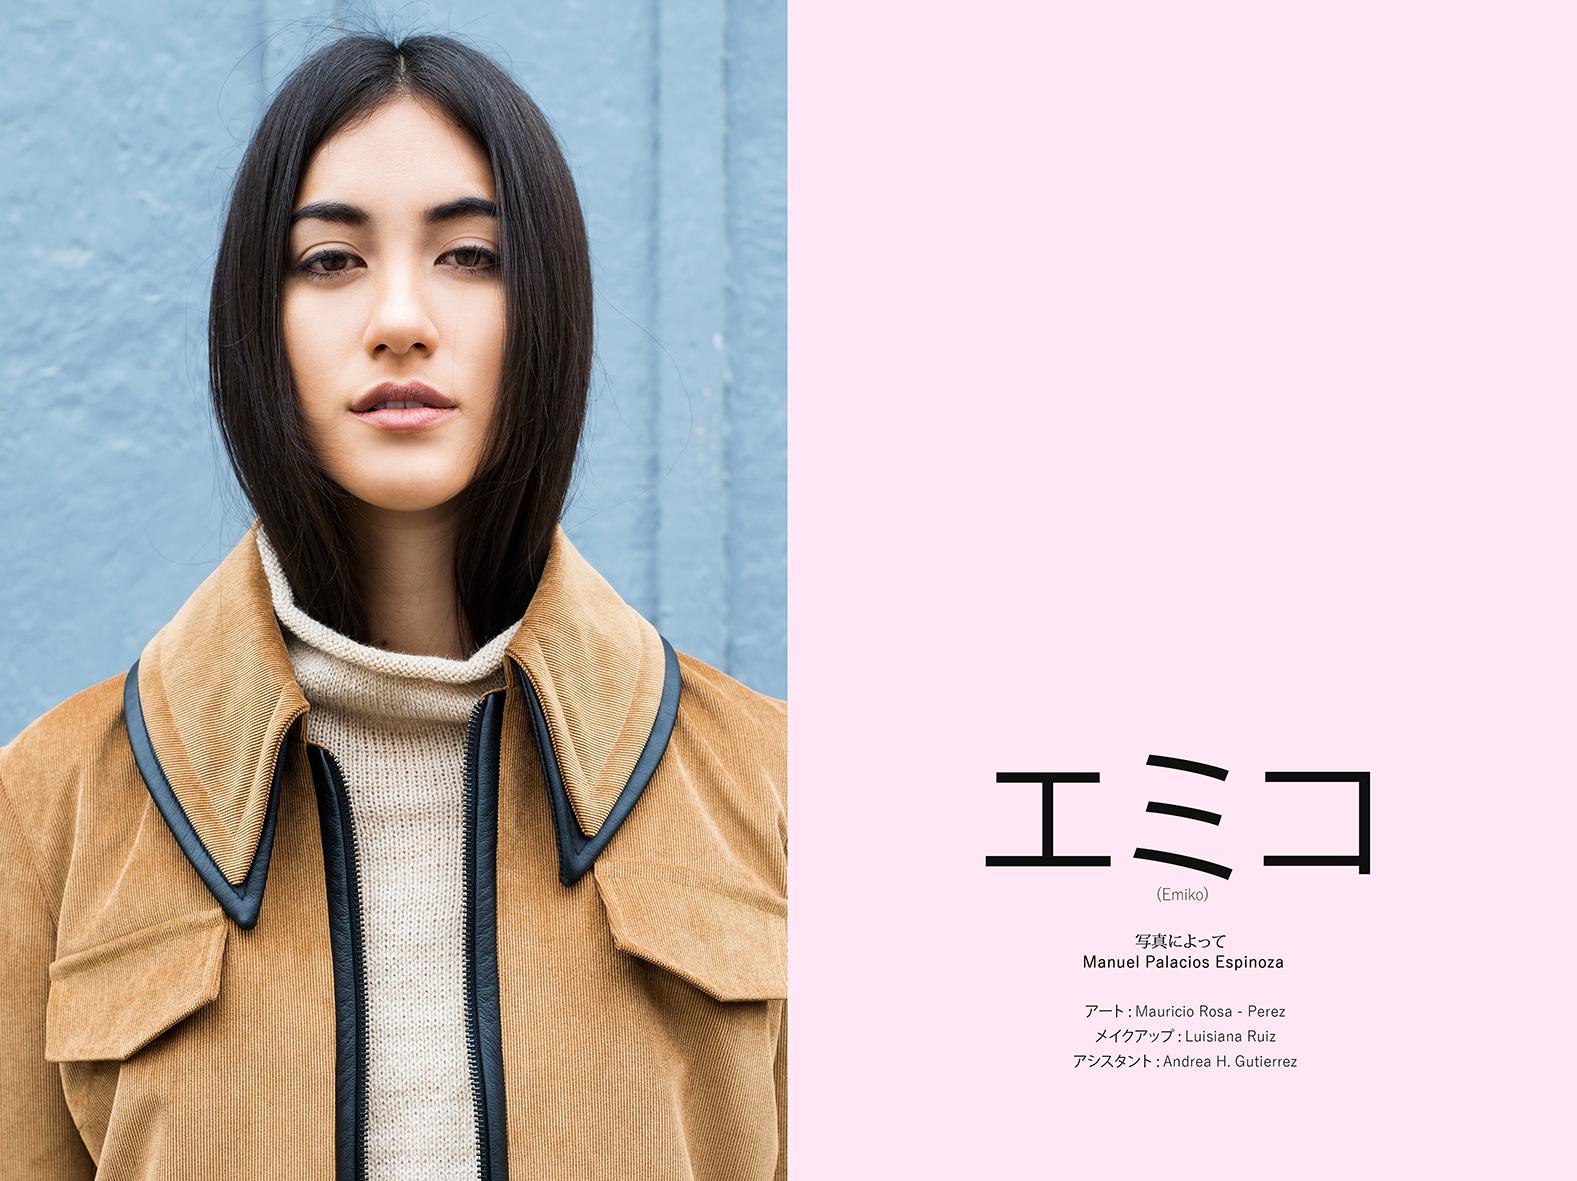 D Emiko Tokuda Editorial Fashion Photography Manuel Palacios Espinoza 2016 Peru Lima Moda Peruana - 01.jpg